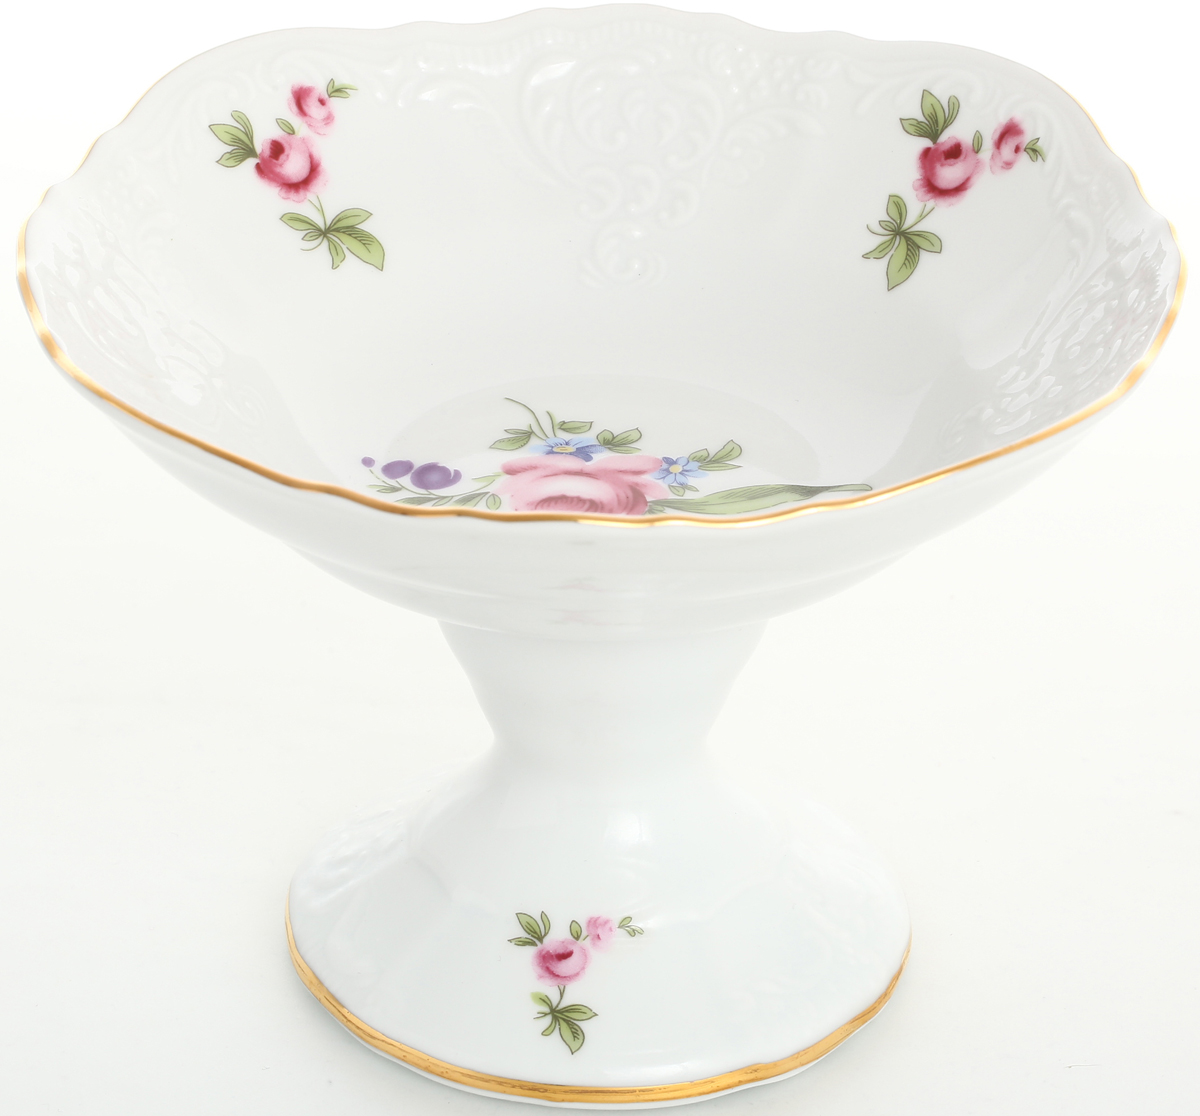 Конфетница Bernadotte Полевой цветок, диаметр 16 см цена